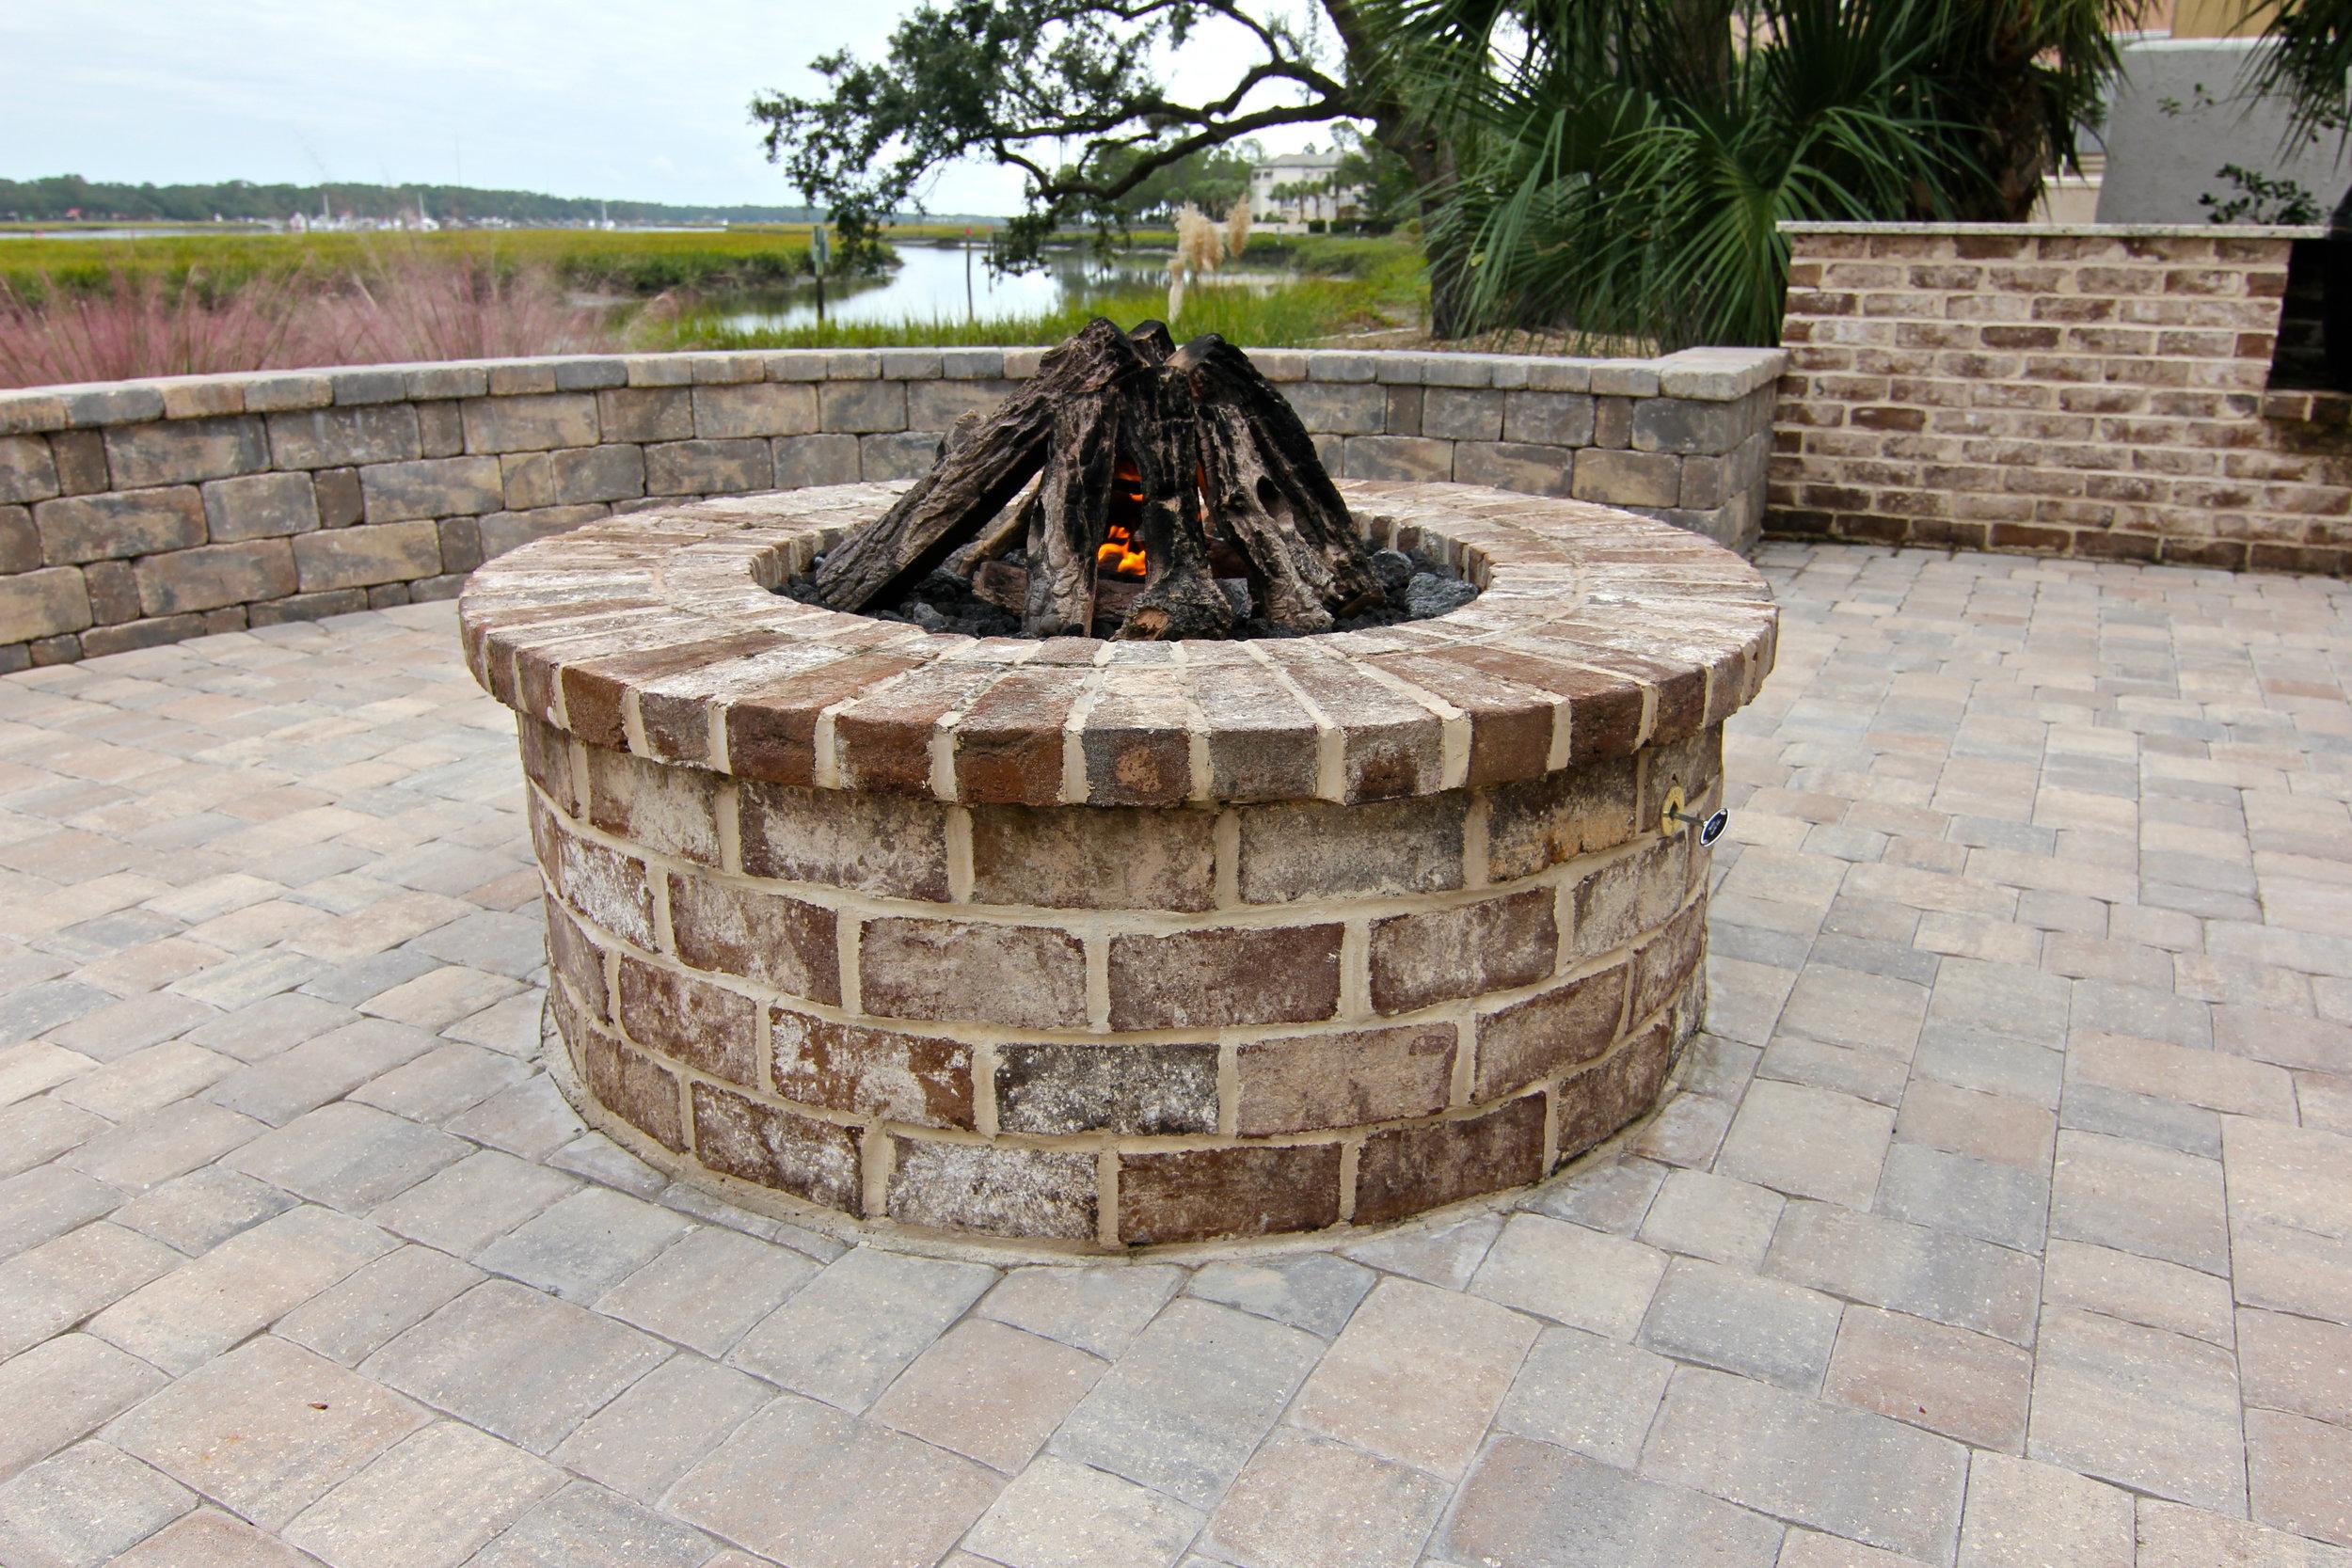 Savannah Grey Brick Fire Pit Picture and Design Idea